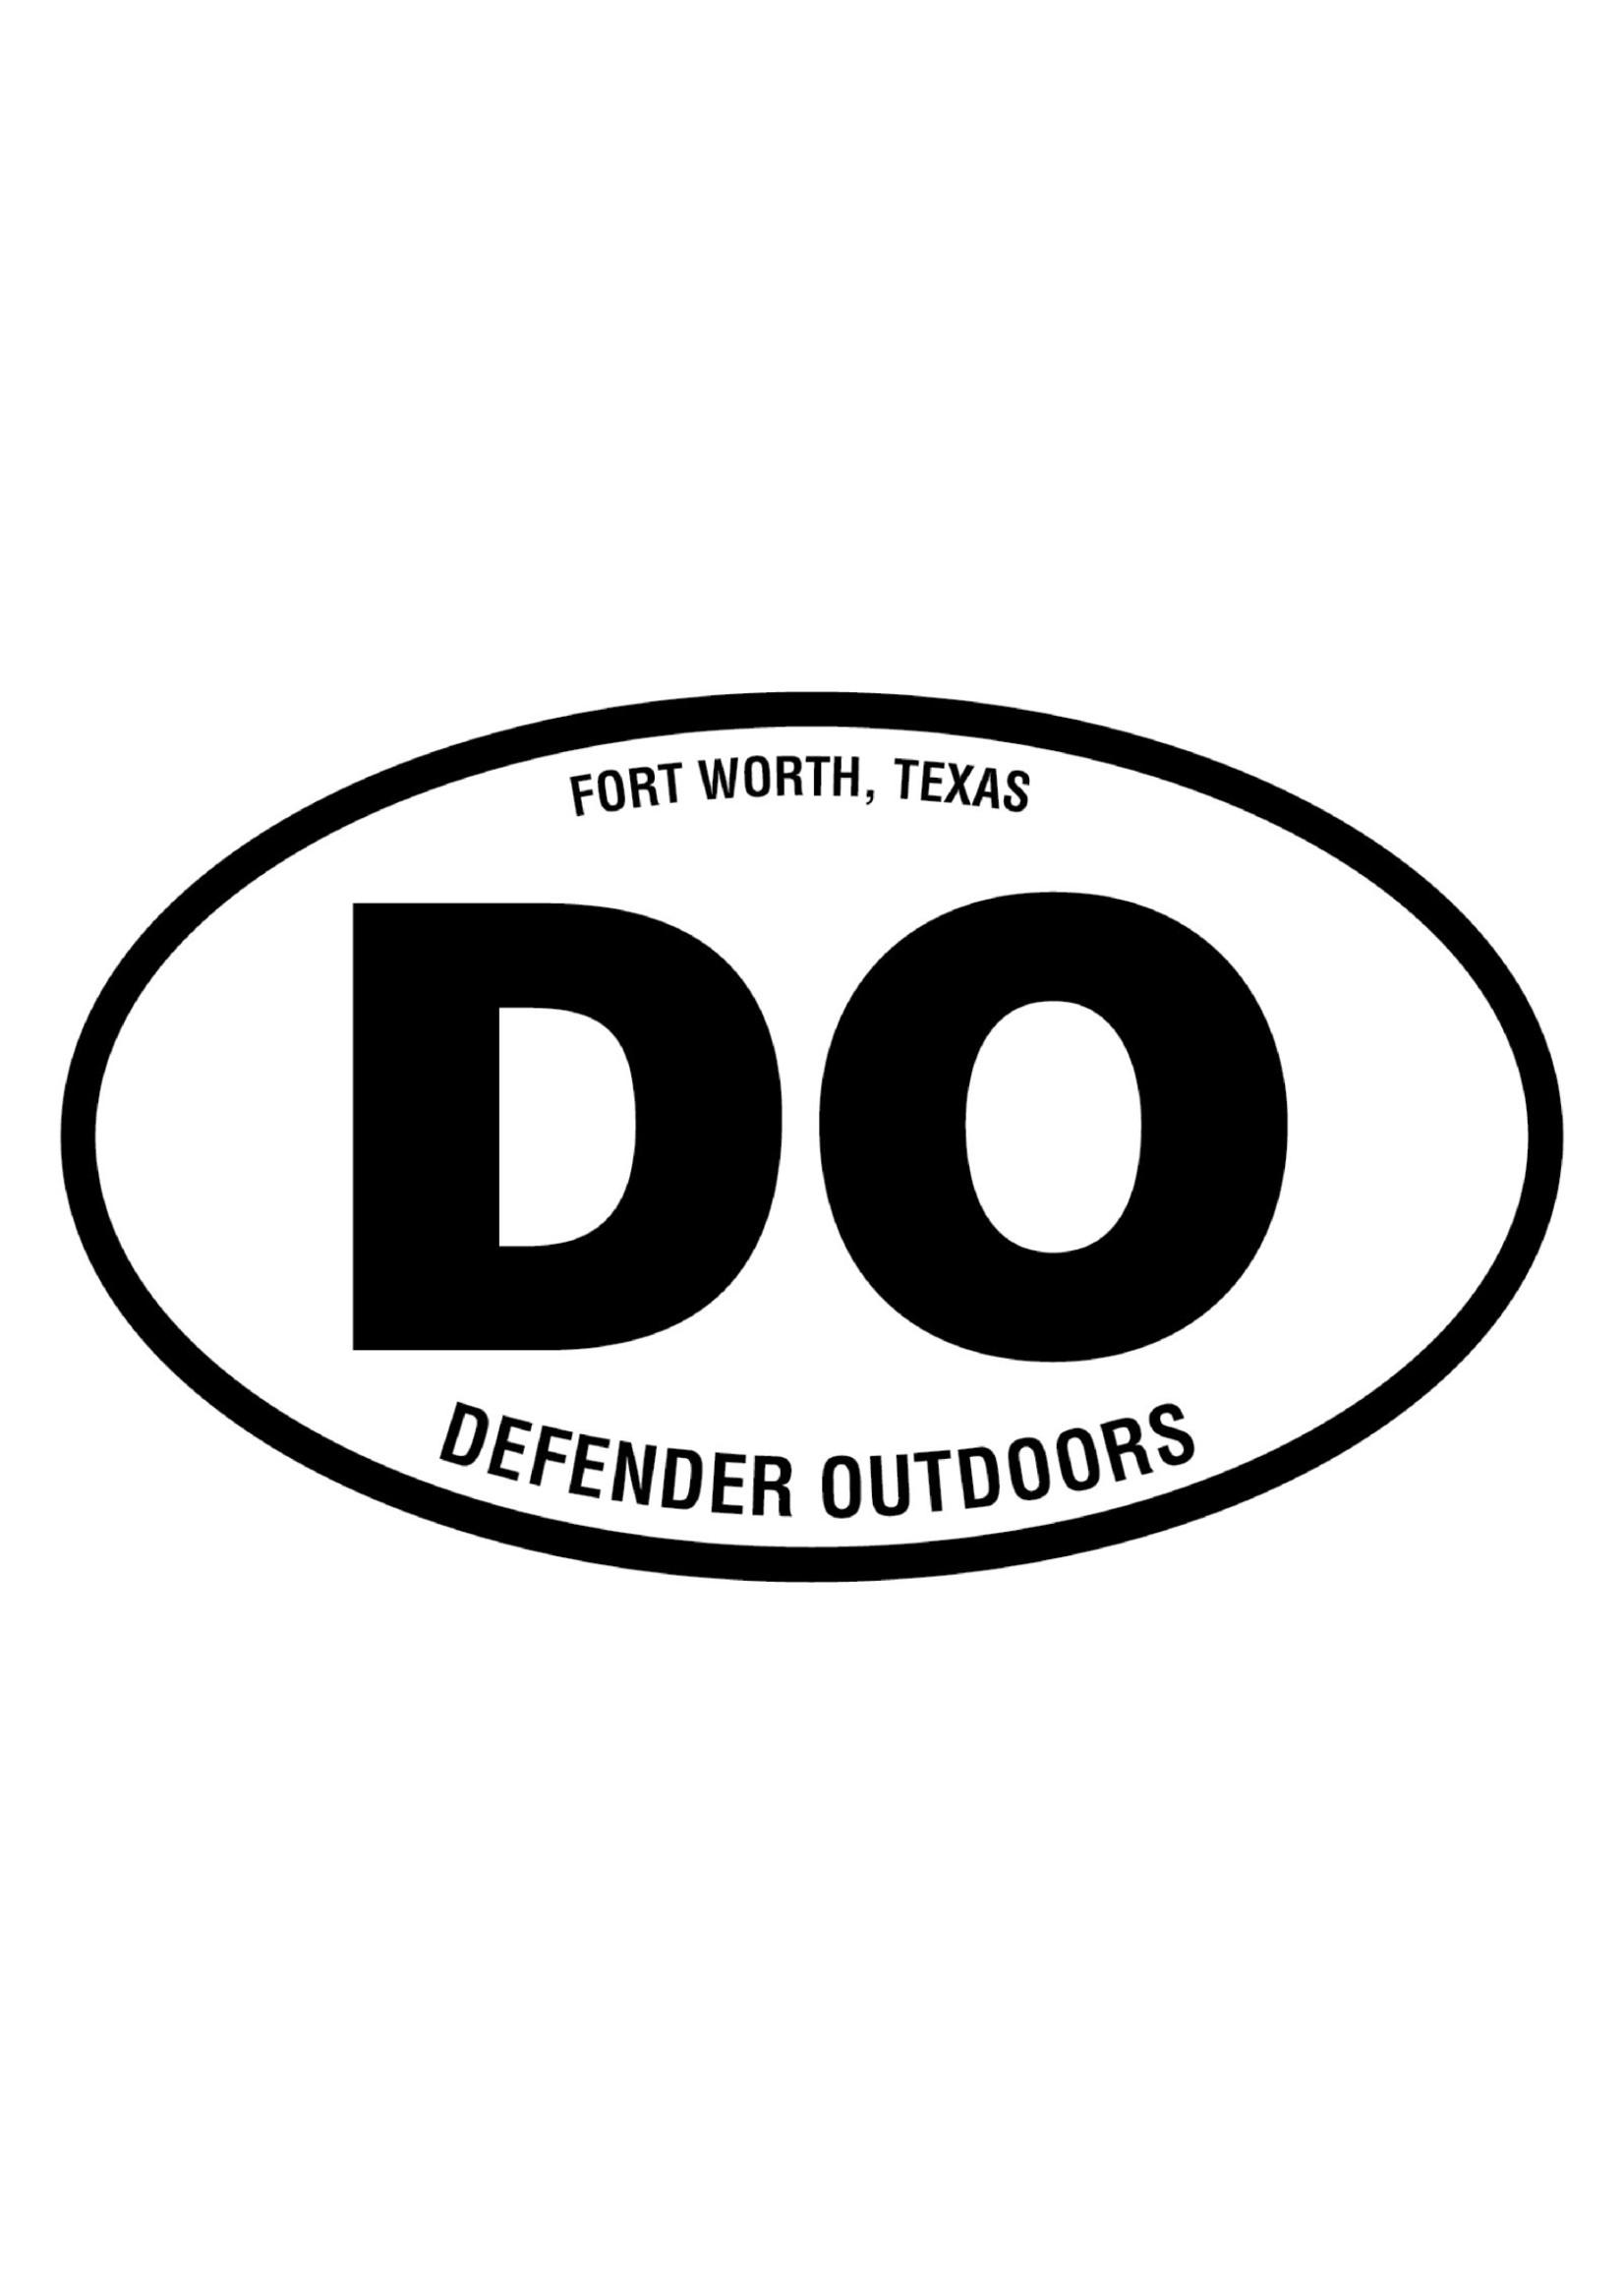 Defender Outdoors Sticker